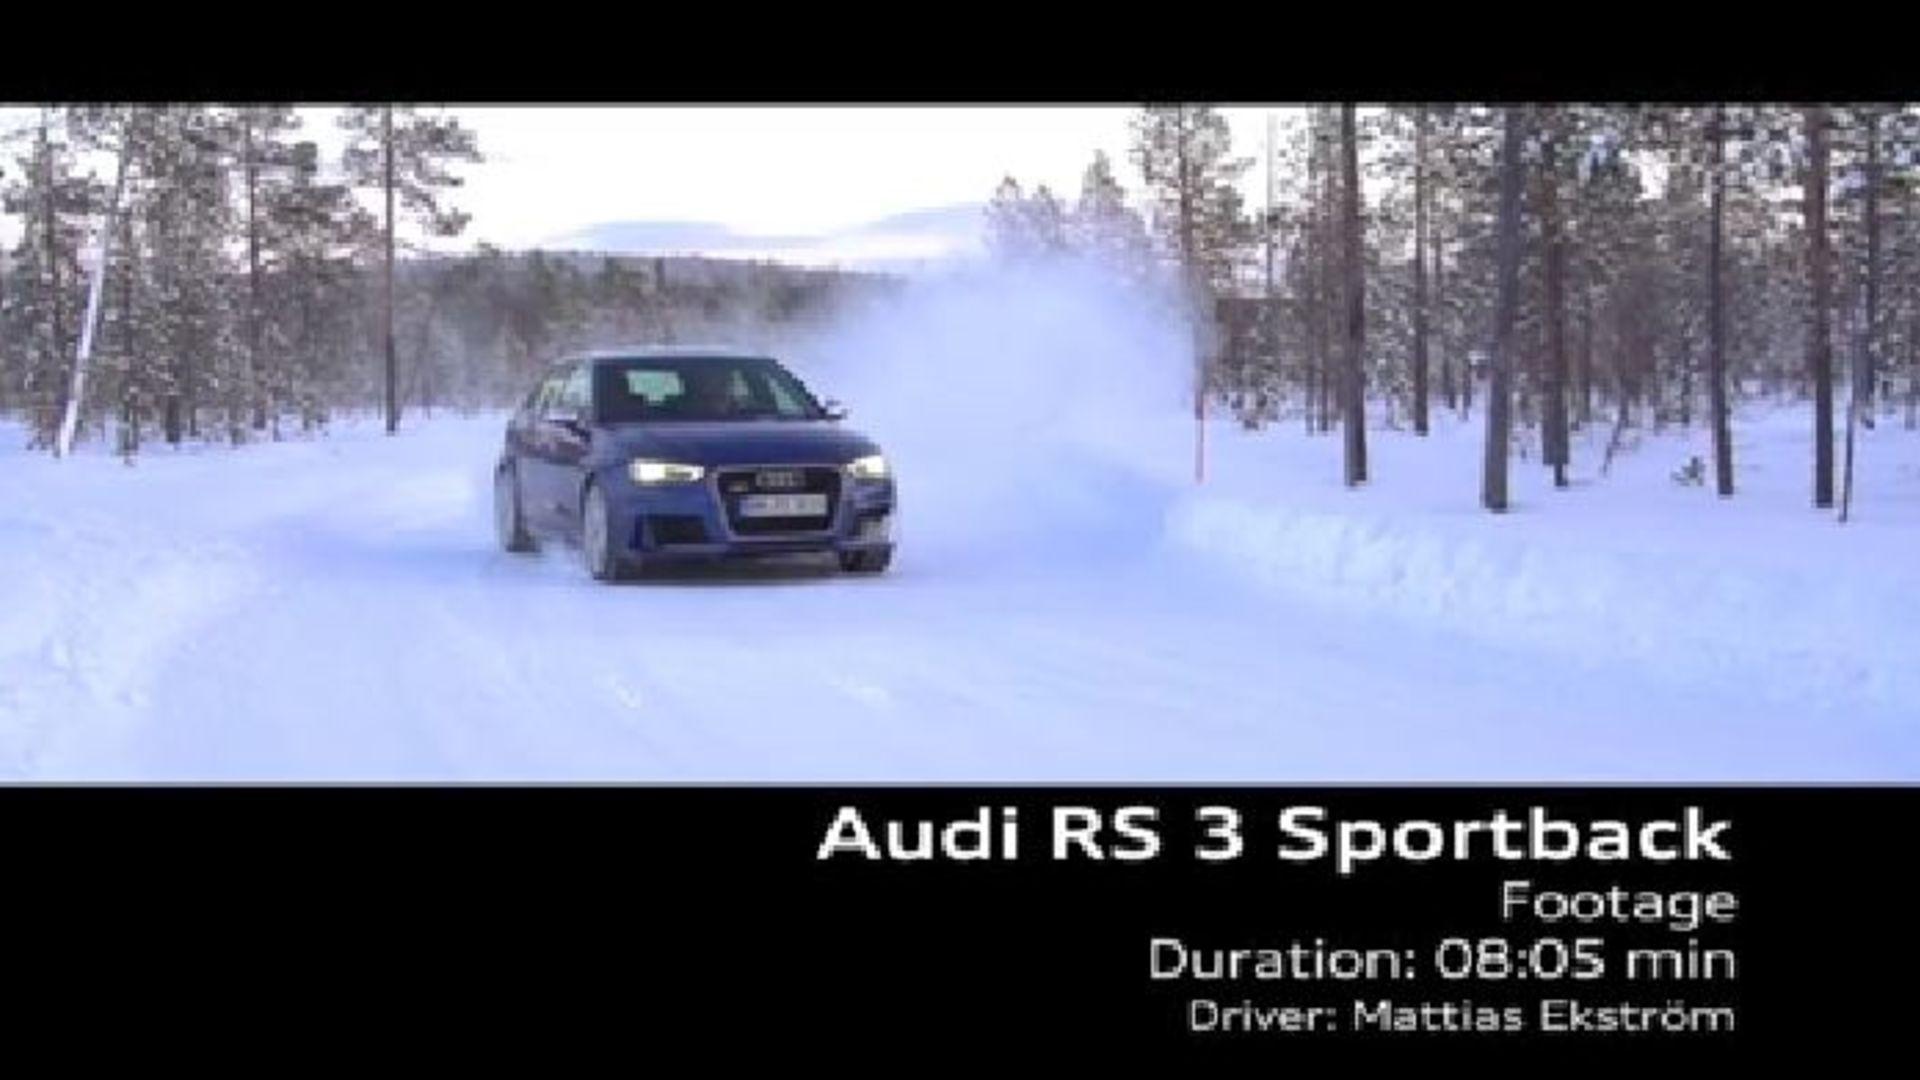 Der neue Audi RS 3 Sportback - Footage